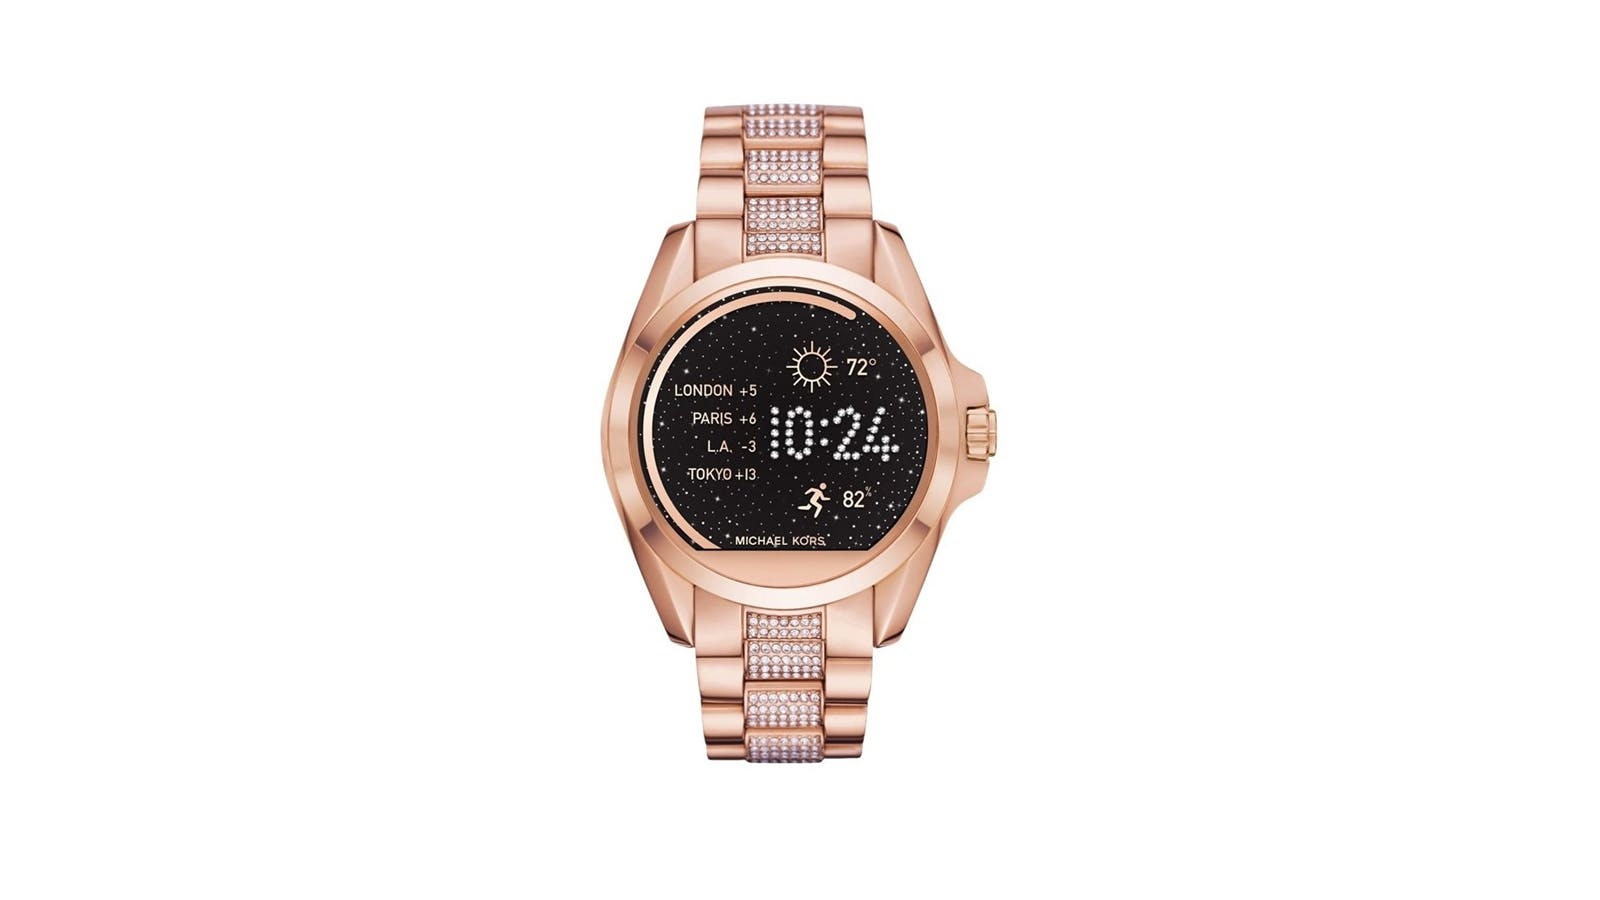 e026b5162920 Michael Kors 44MM Bradshaw Rose Gold-Tone Smartwatch